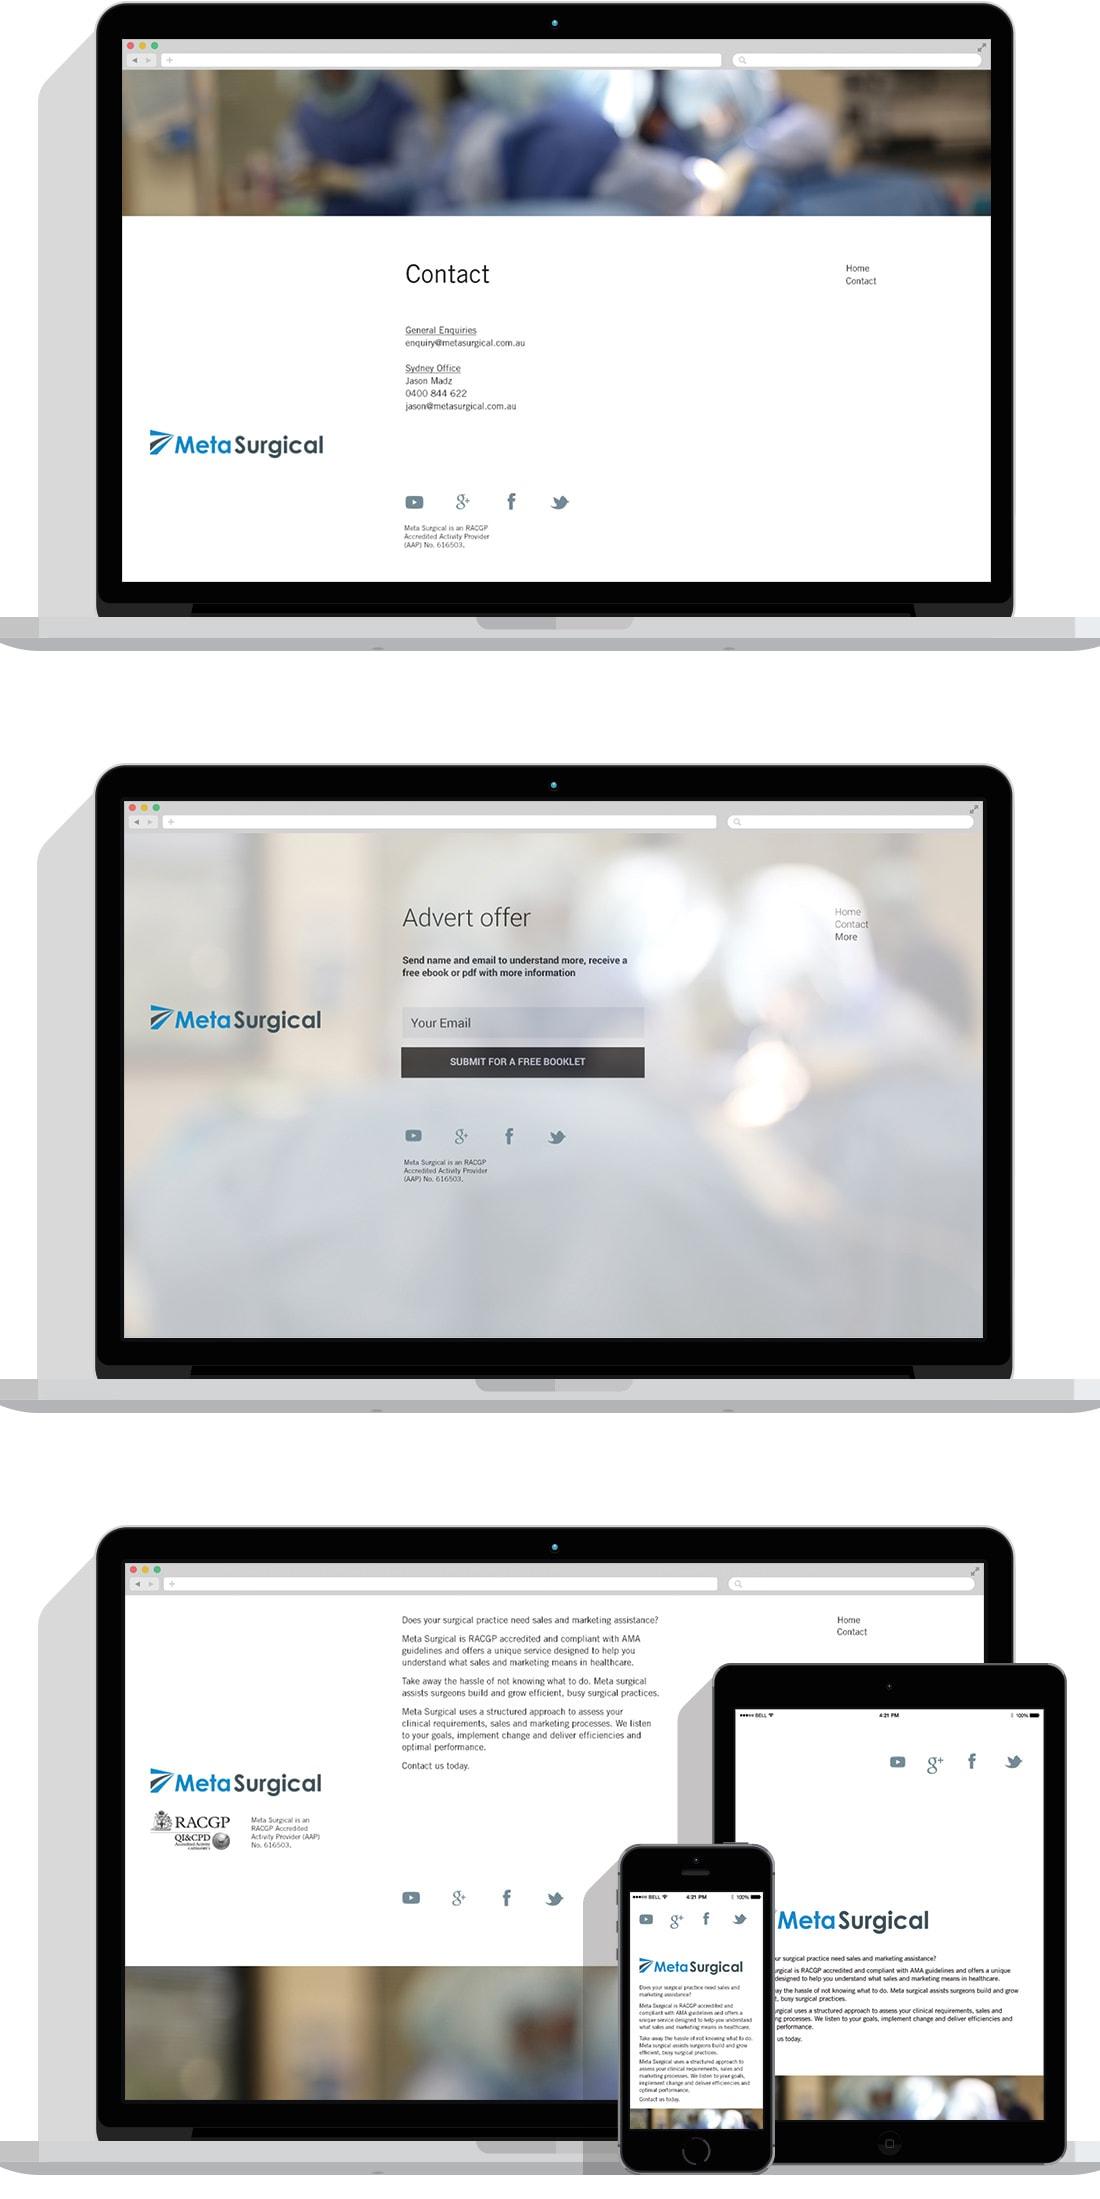 MetaSurgical website